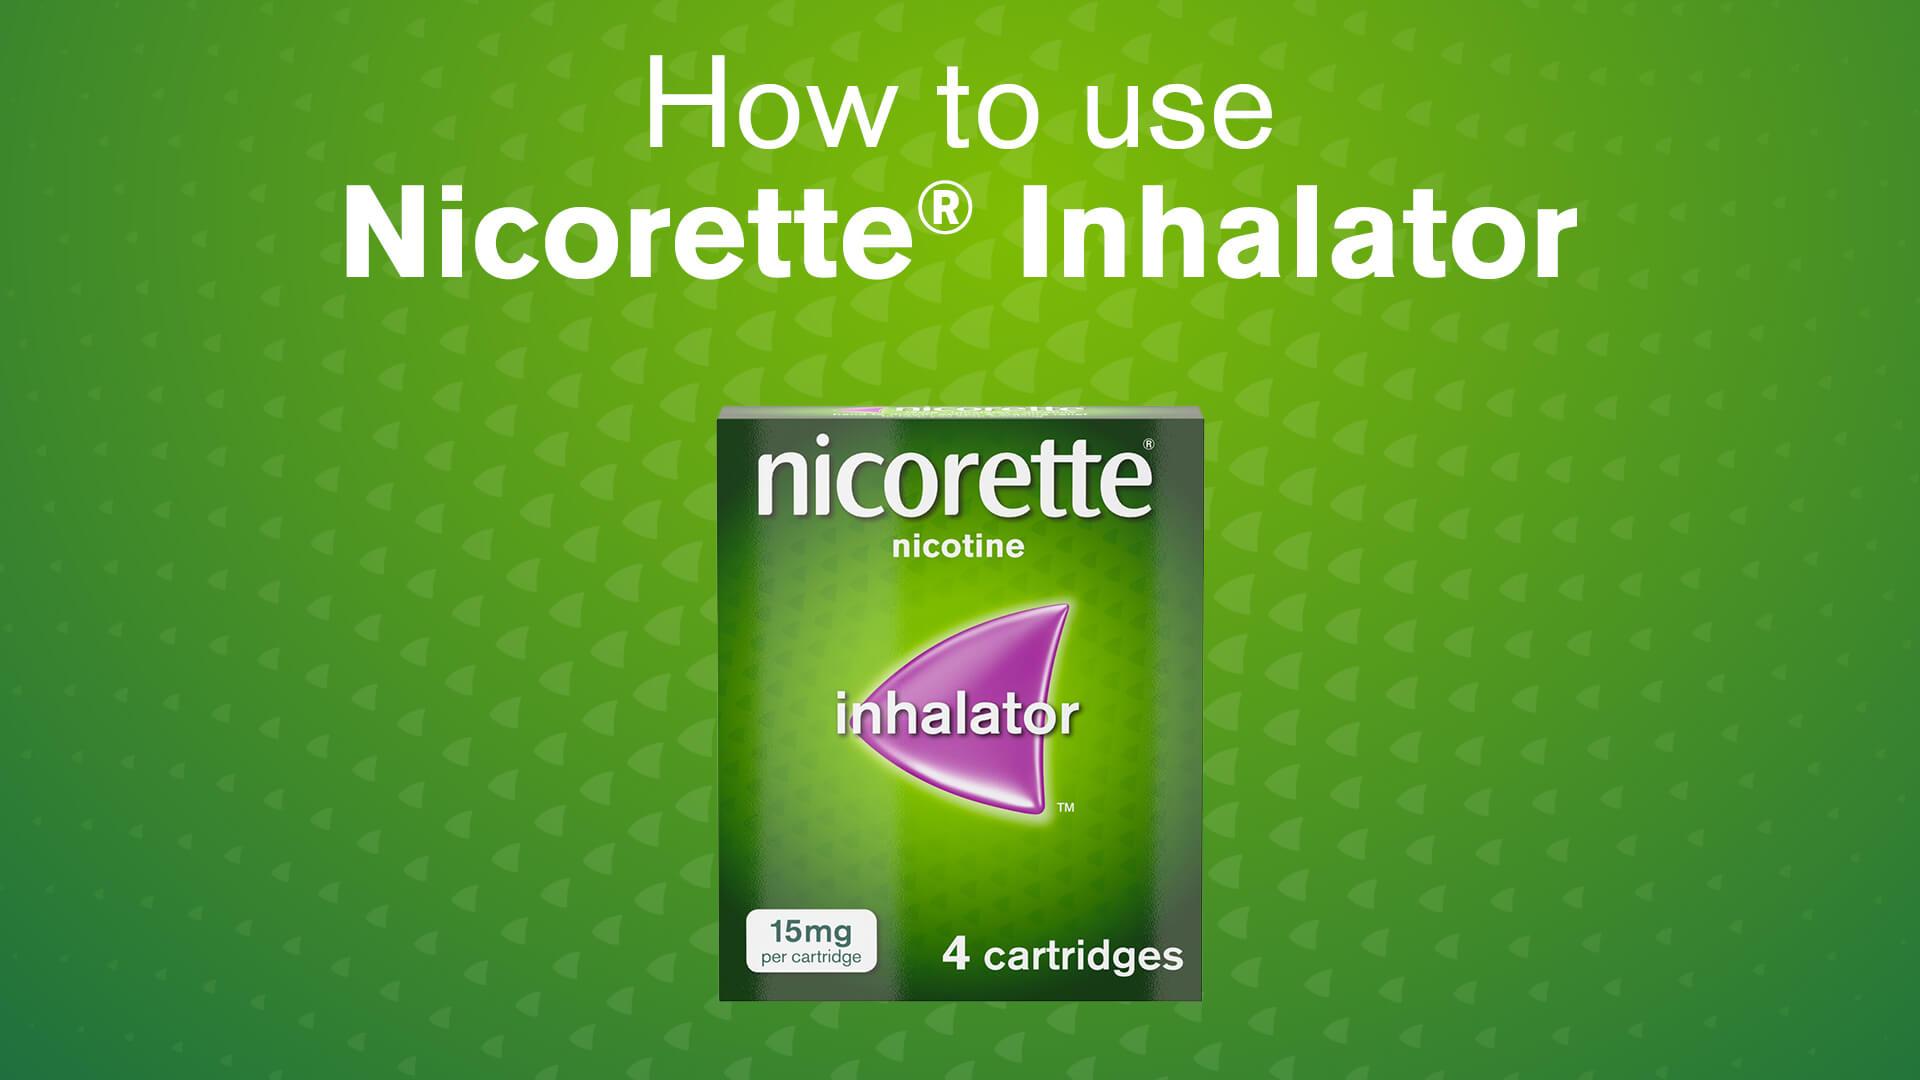 Nicorette® Inhalator